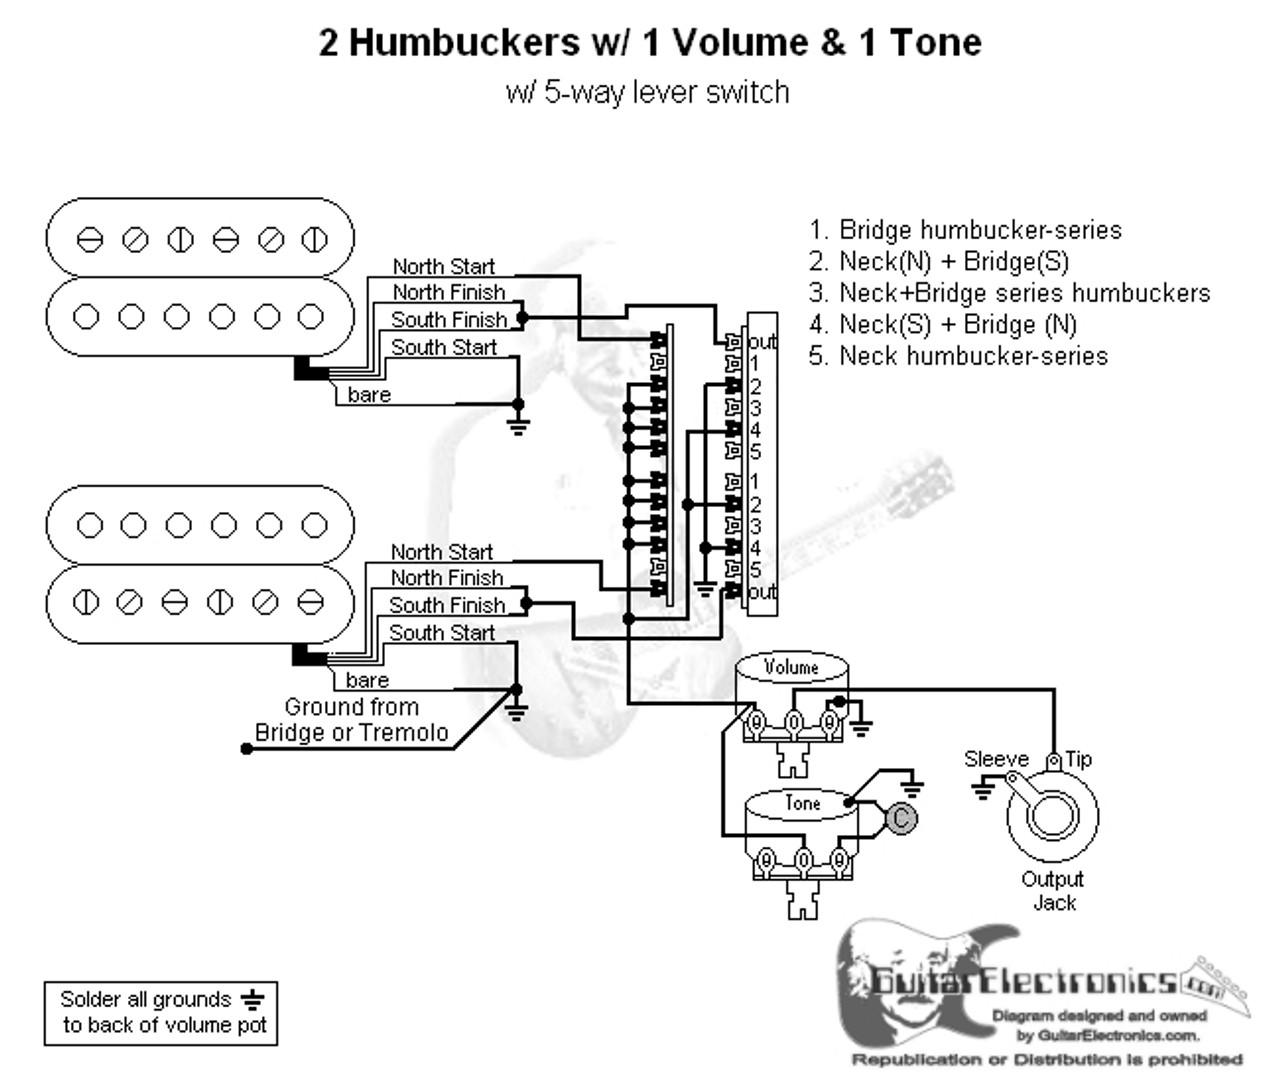 2 humbuckers 5 way lever switch 1 volume 1 tone 05 Fender 5 Way Switch Wiring Diagram 2 Humbuckers Fender 5 Way Switch Wiring Diagram 2 Humbuckers #5